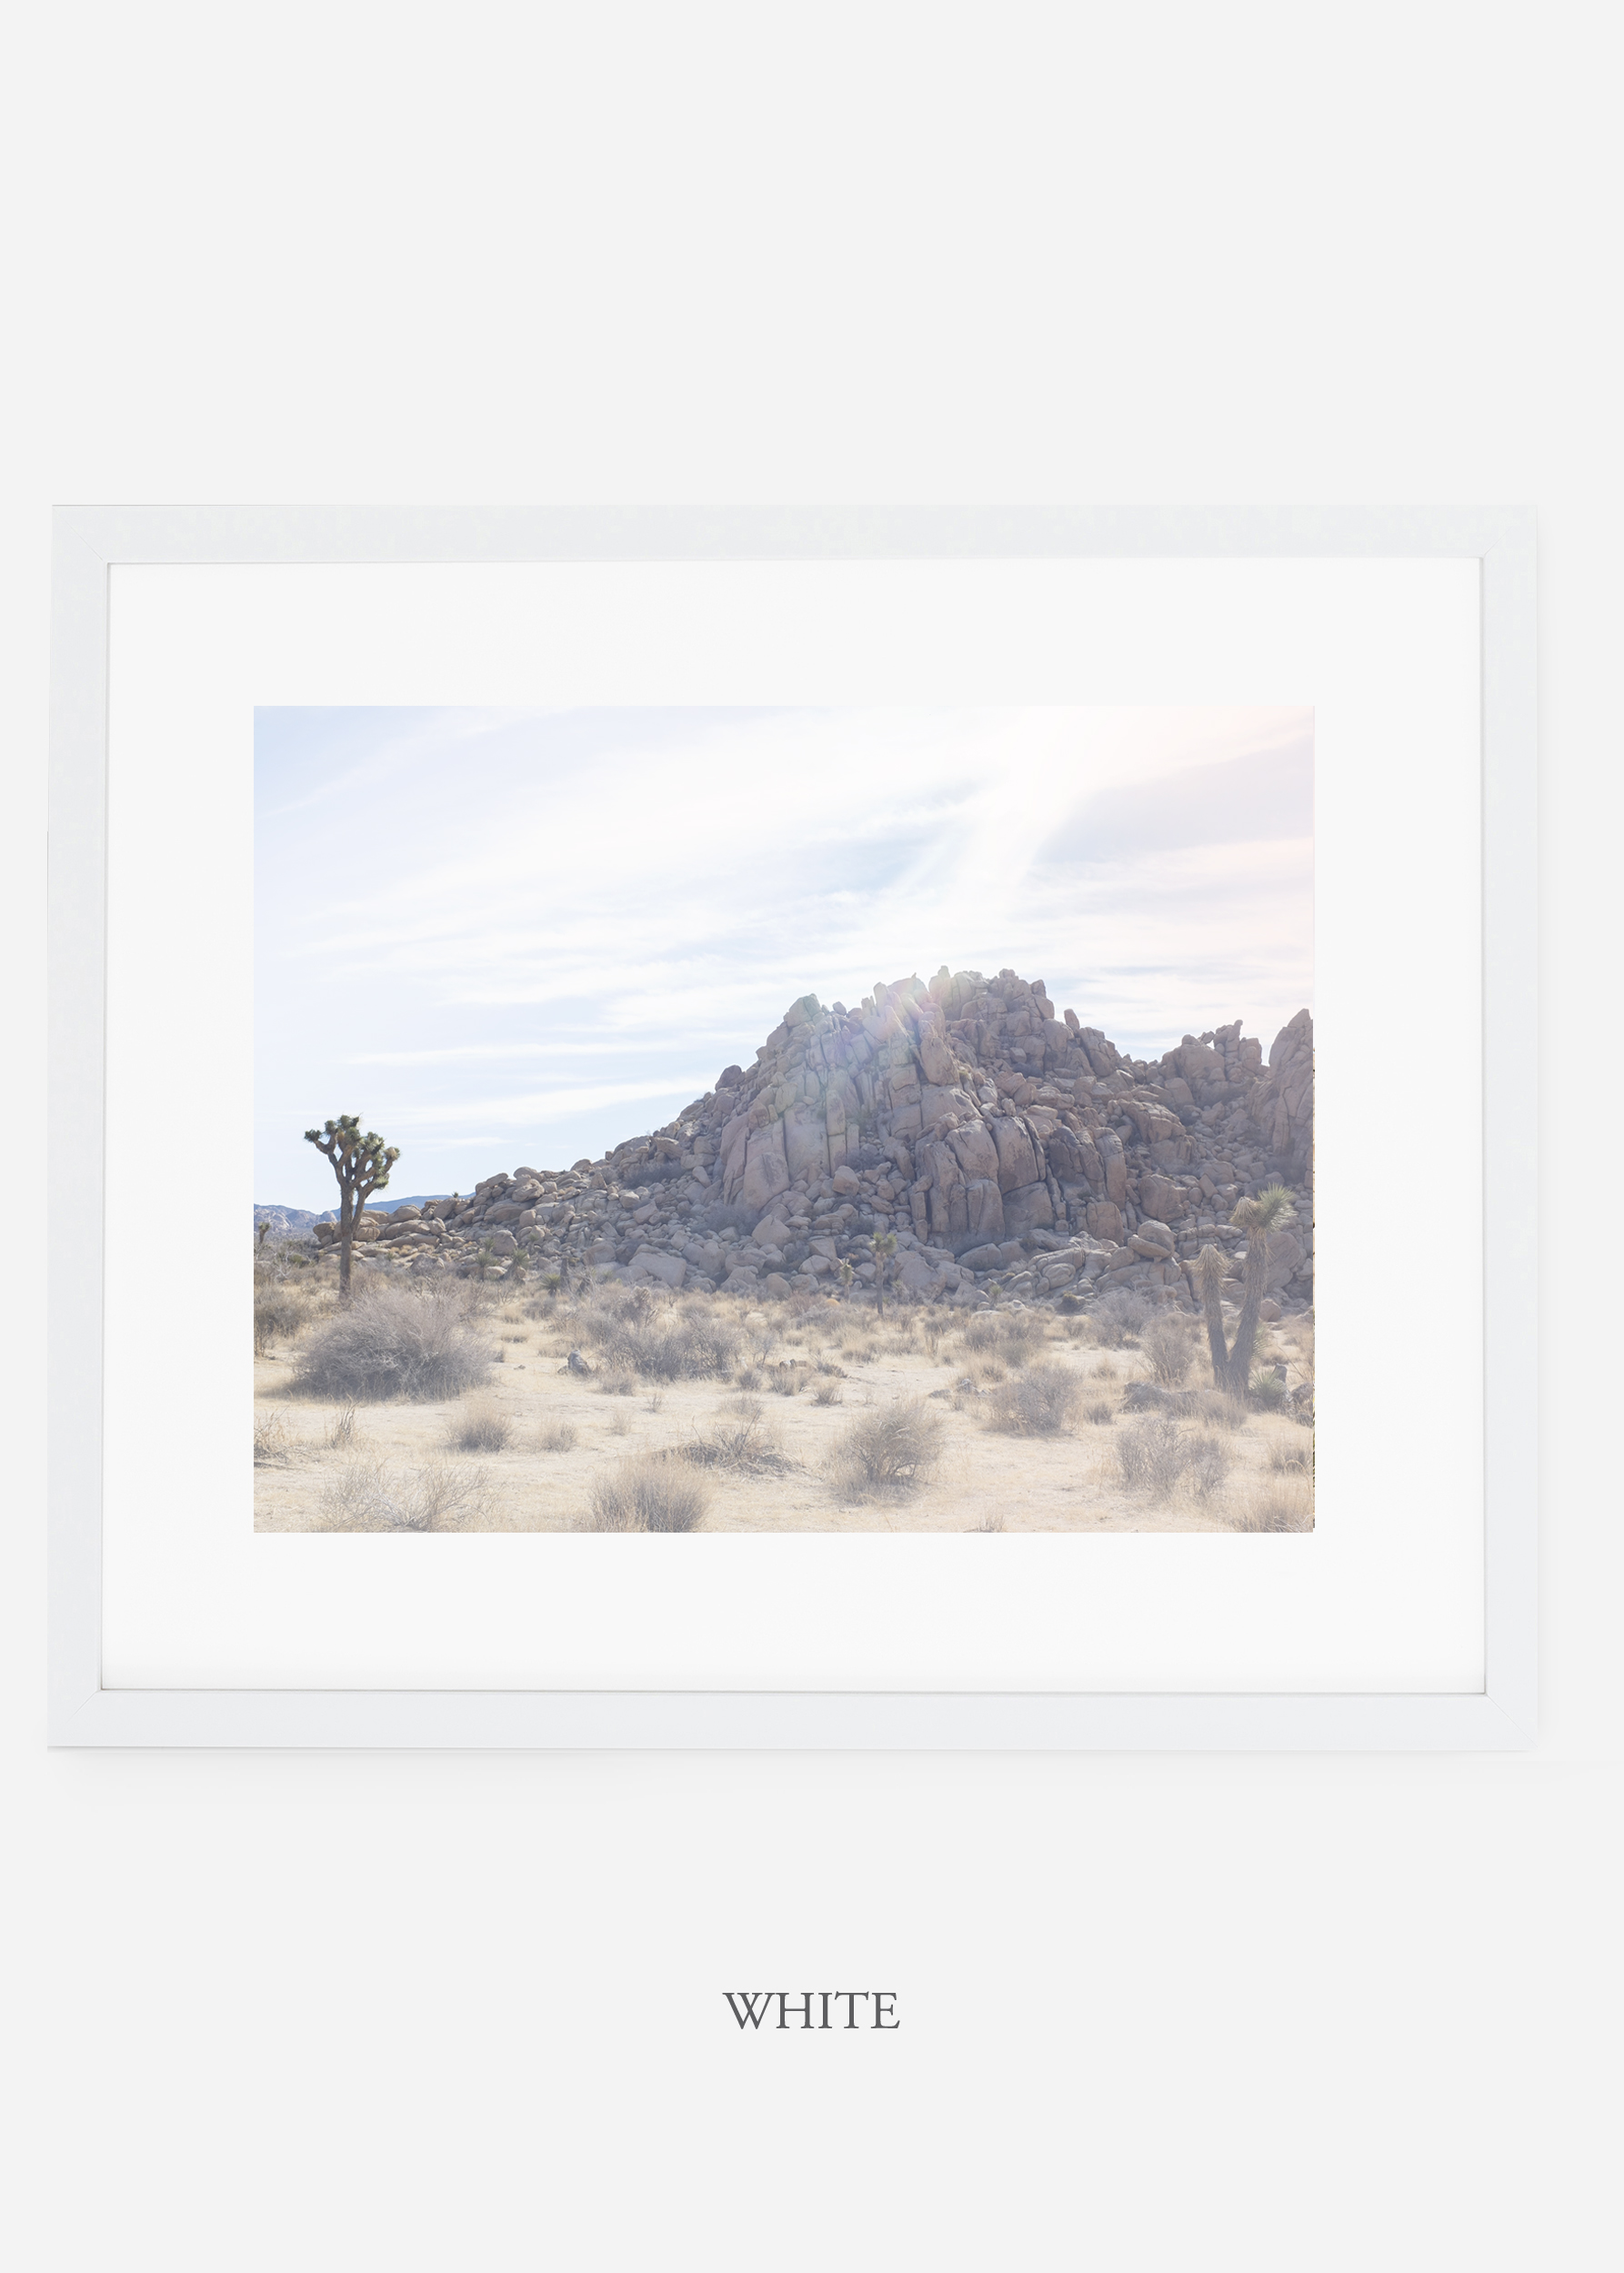 WilderCalifornia_whiteframe_JoshuaTree_No.20_interiordesign_prints_art.jpg